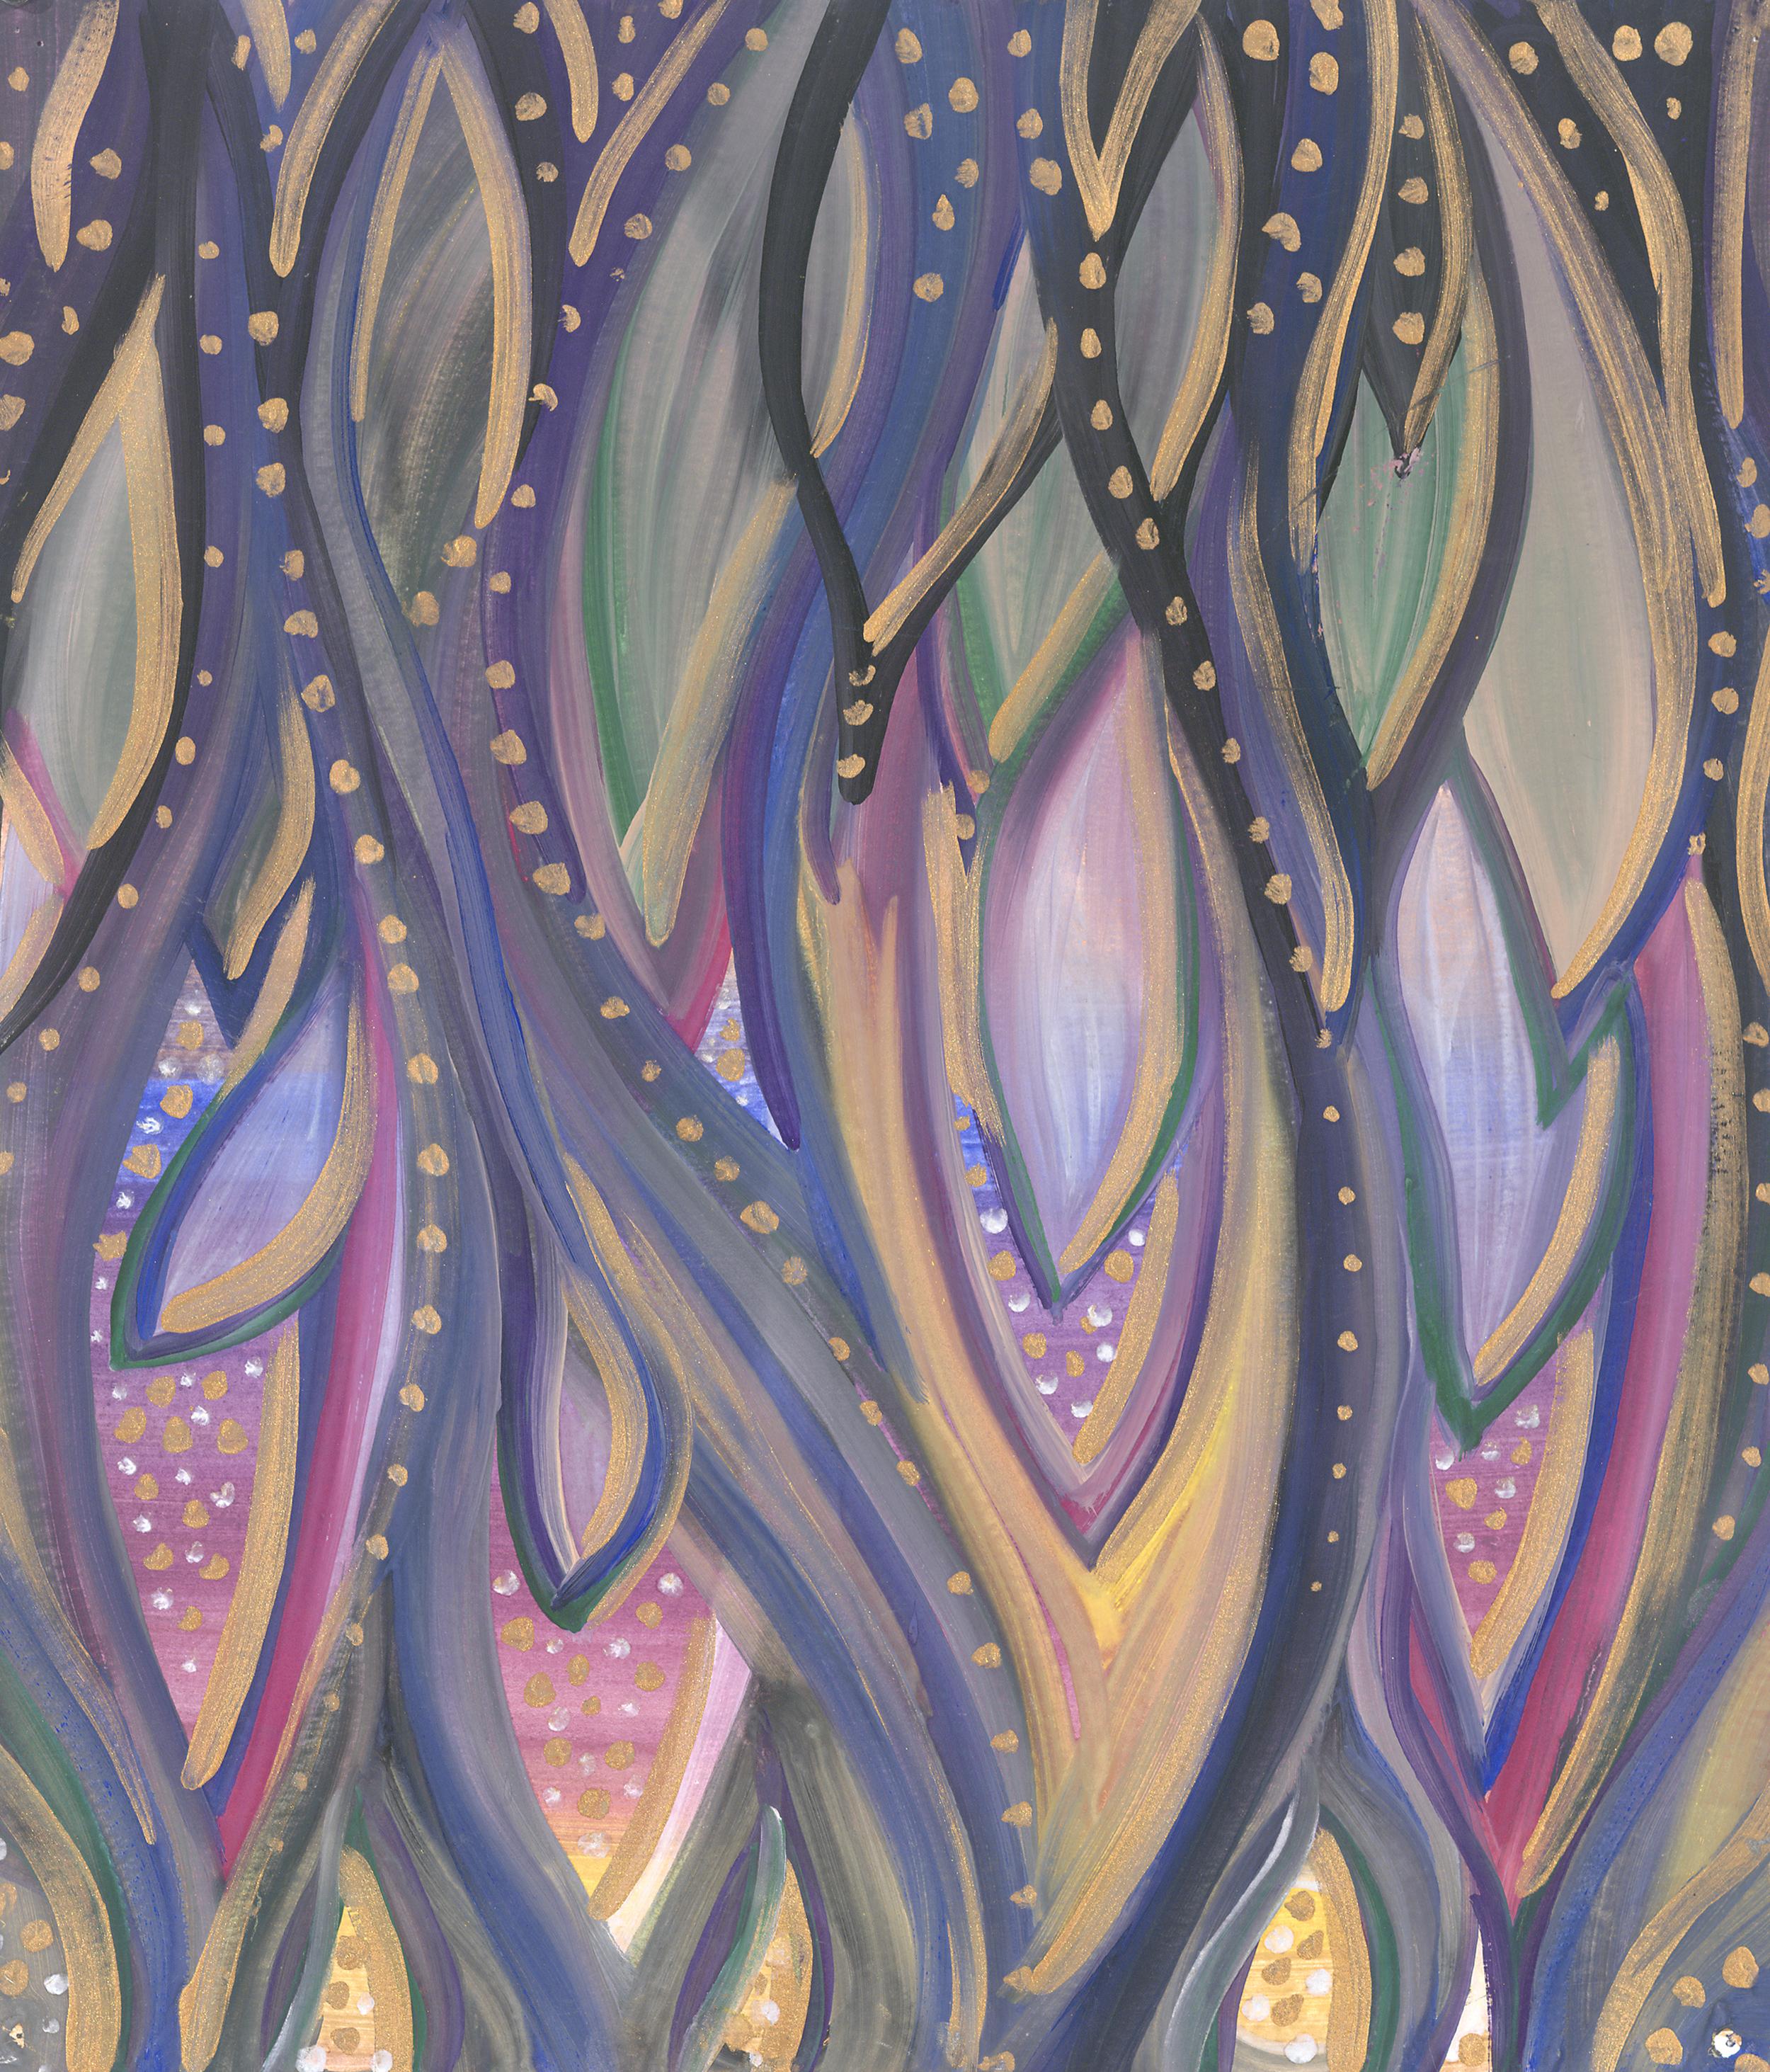 Painted feathers, organics